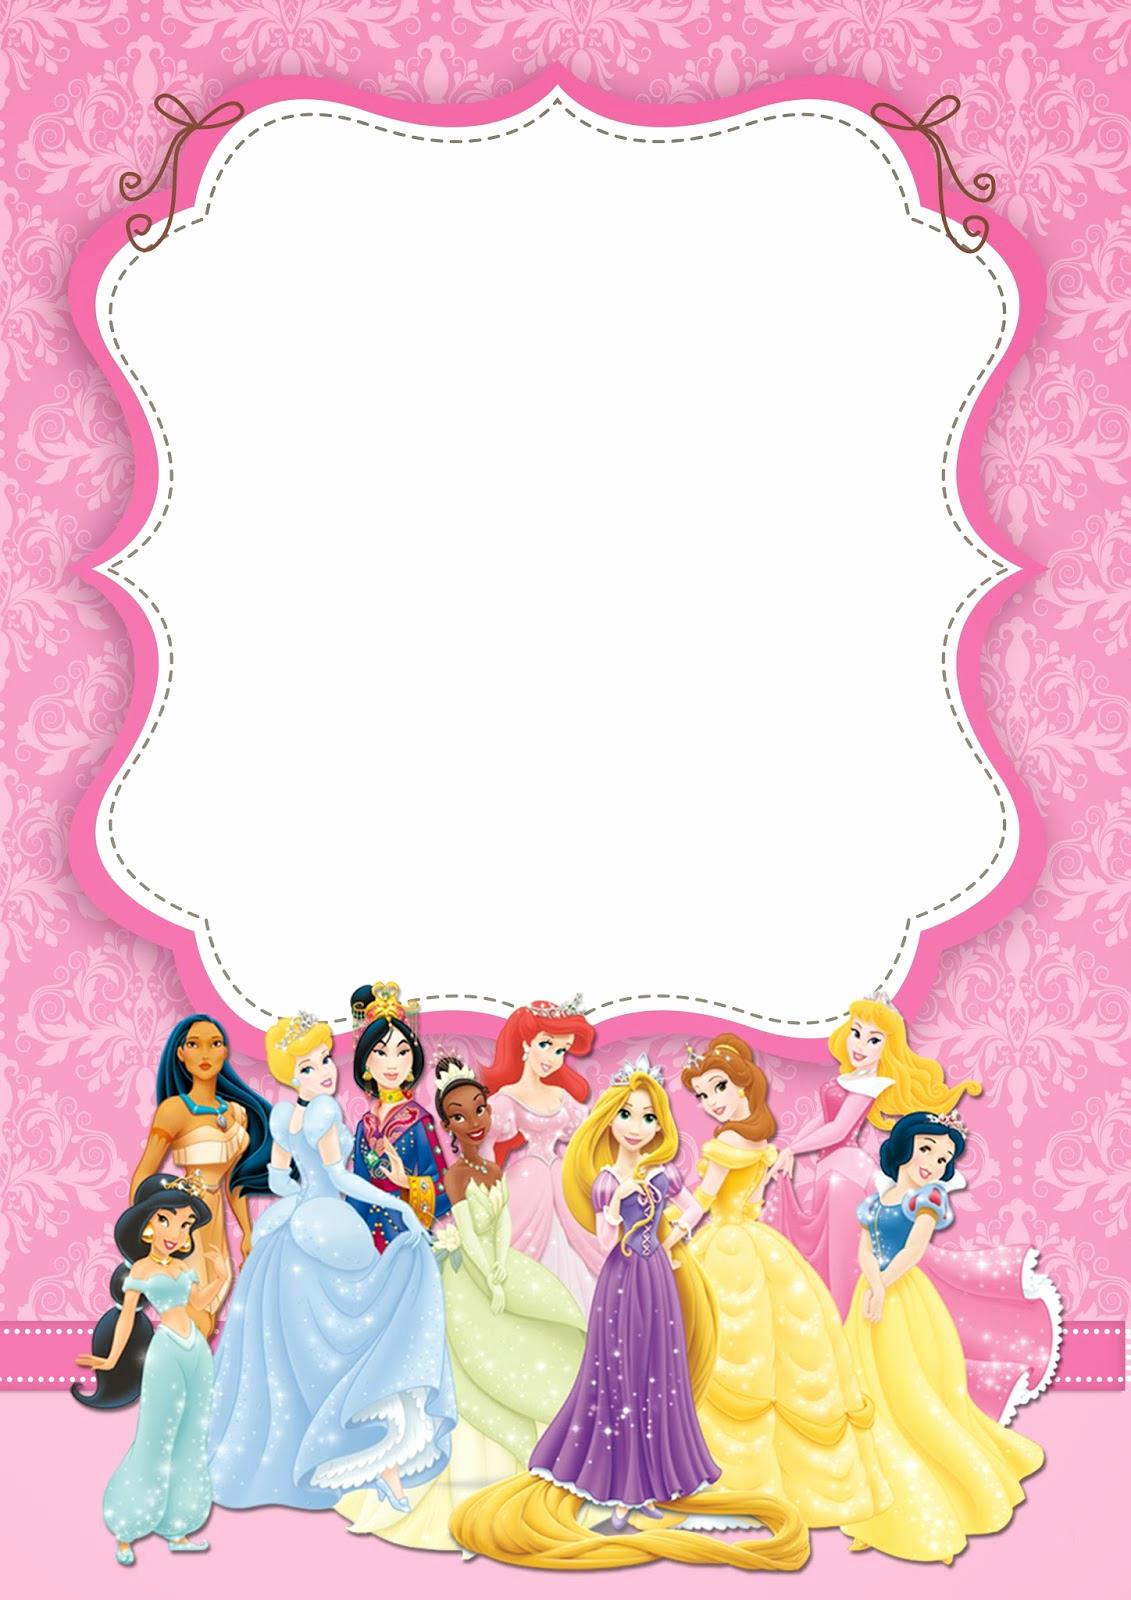 Free Princess Invitation Template Elegant Free Printable Disney Princess Ticket Invitation Template